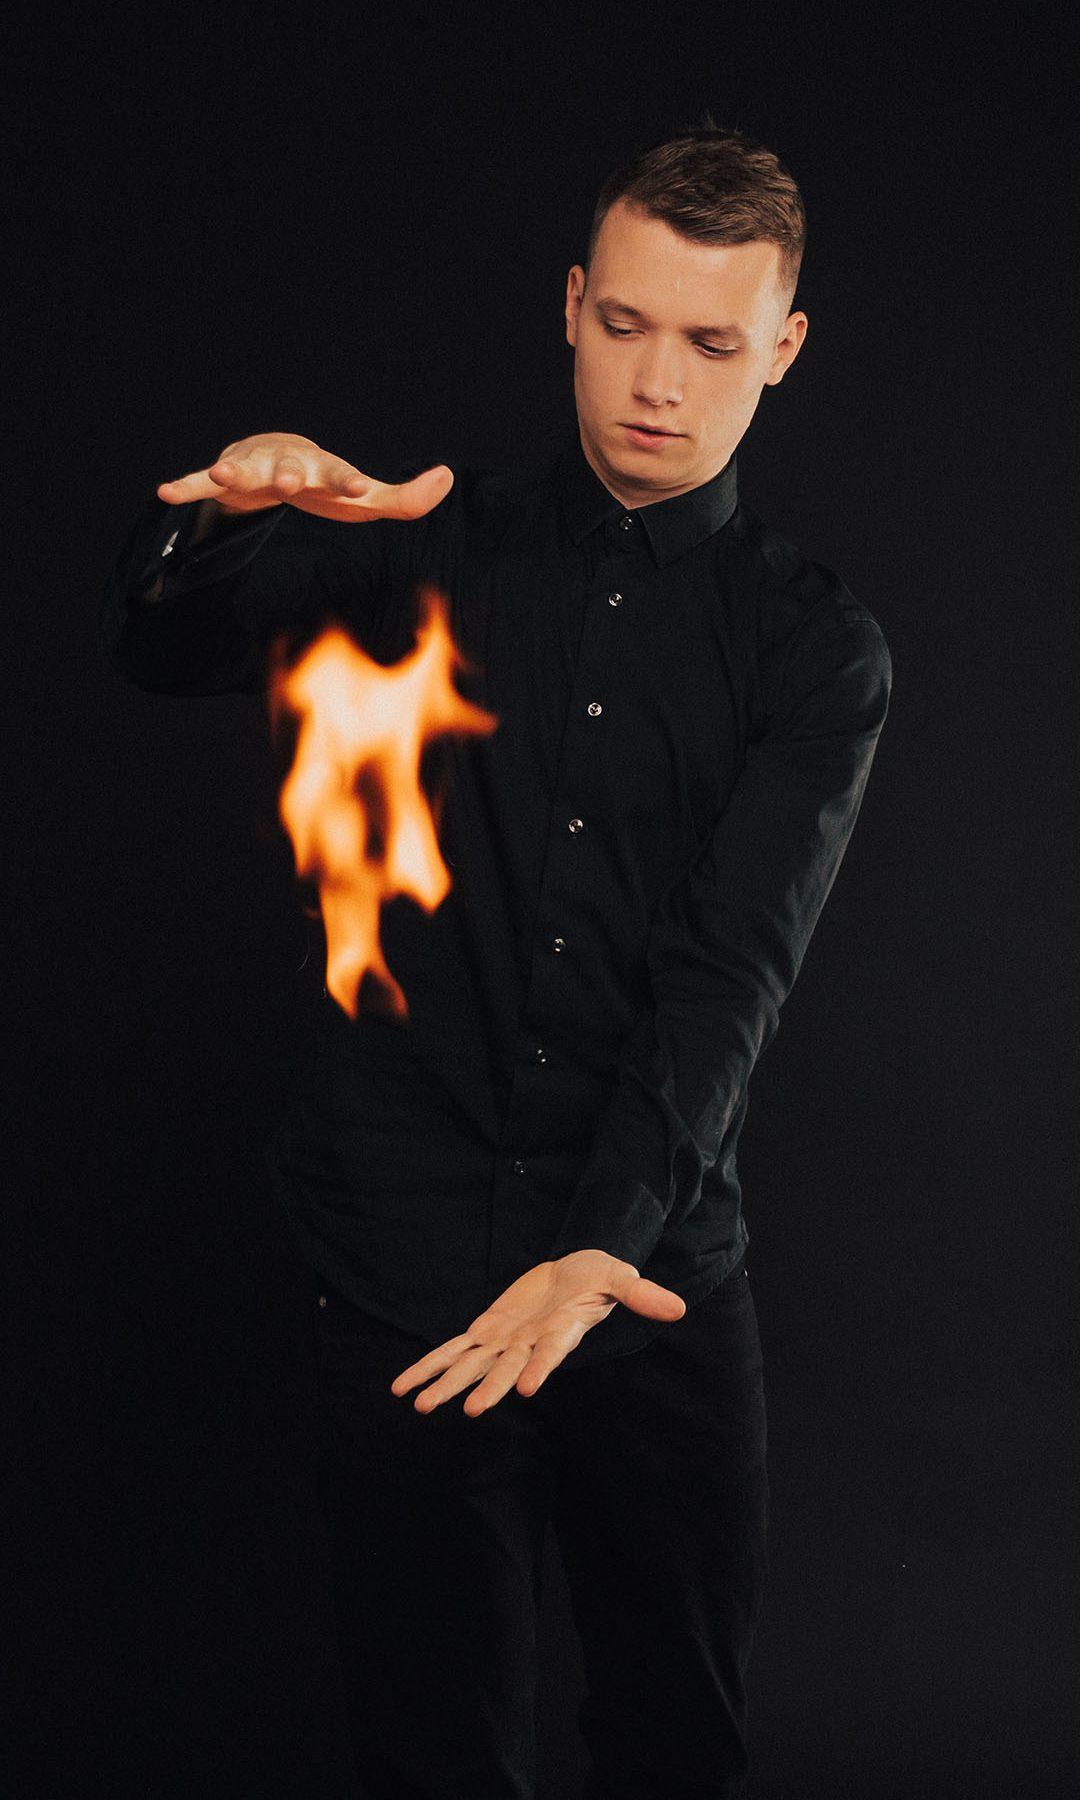 Richard-kaarna-mustkunstnik-closeup